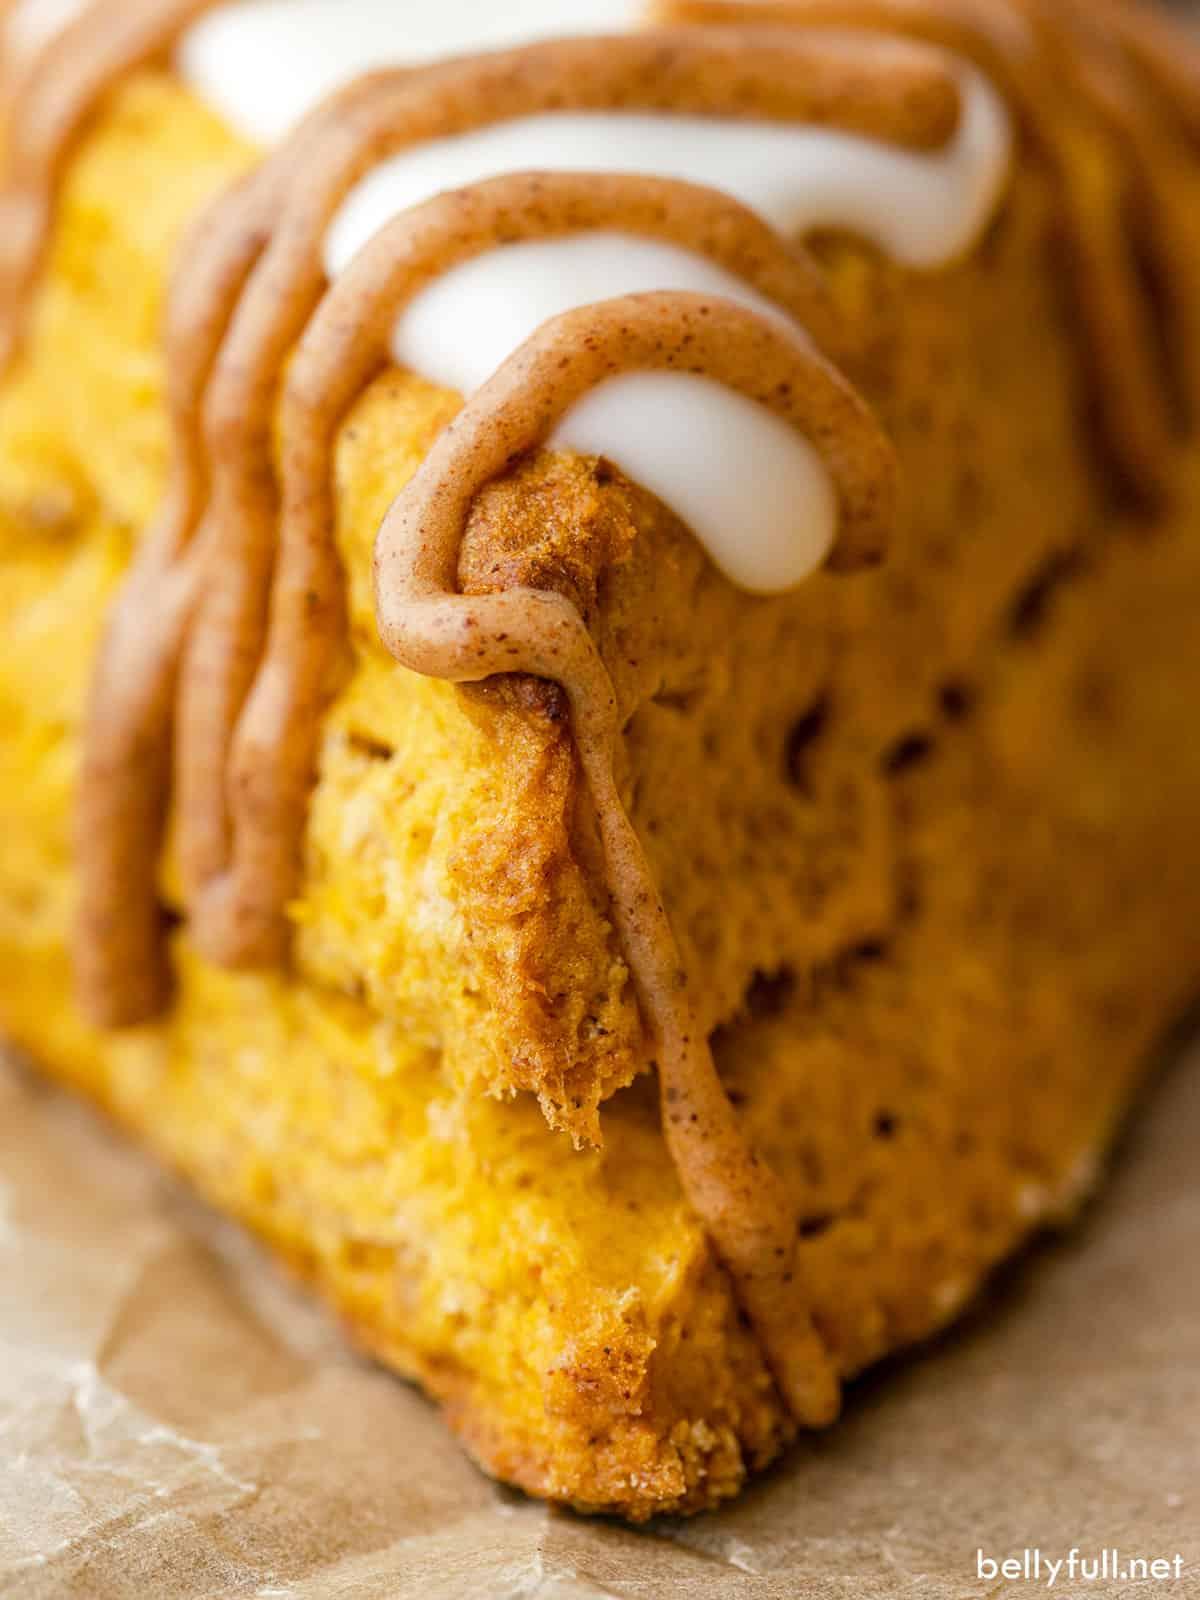 Close-up of a copycat Starbucks pumpkin scone